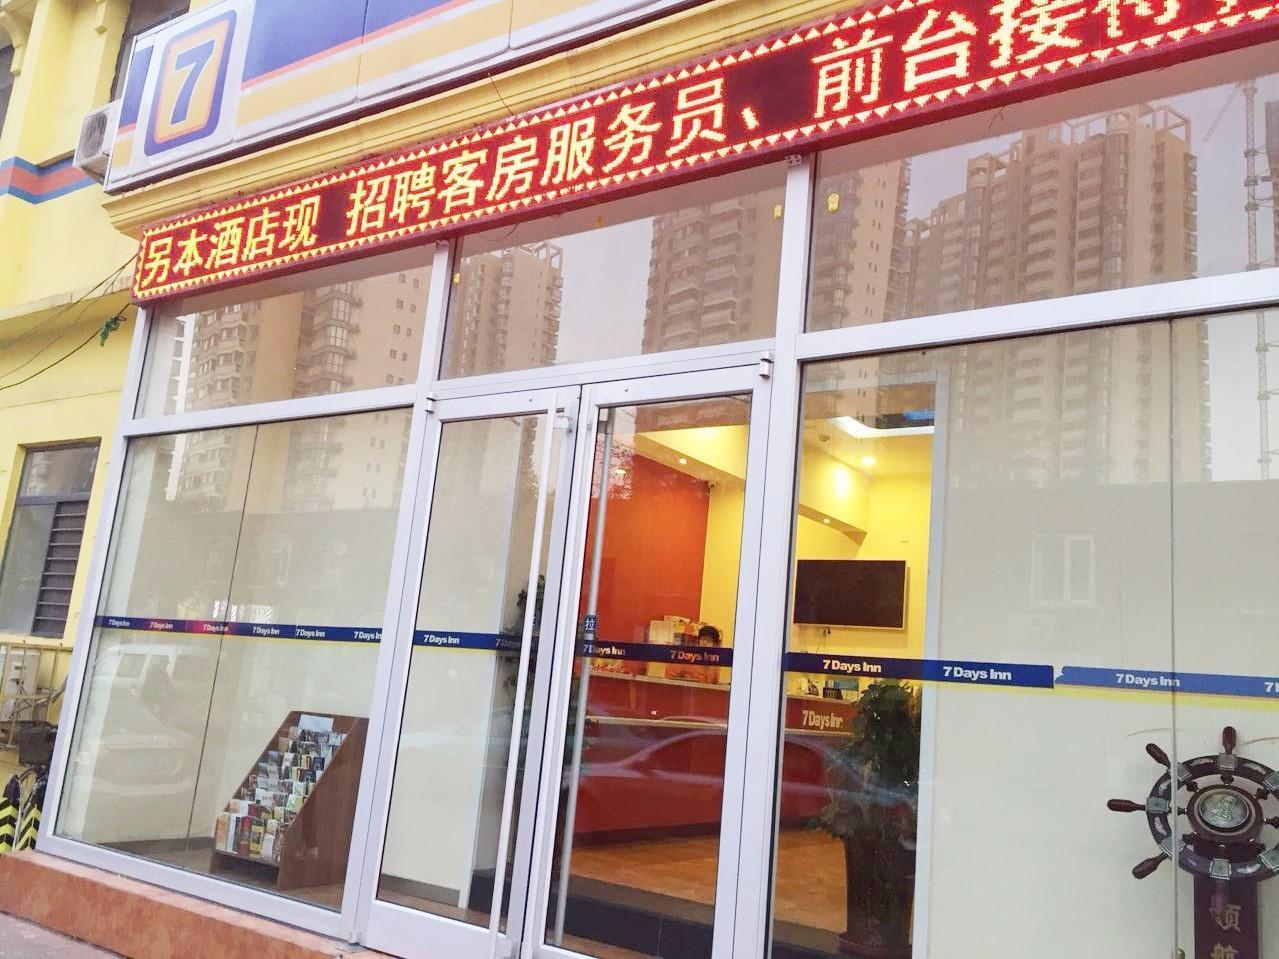 7 Days Inn�Tianjin Nanshi Shipin Street Ophthalmology Hospital